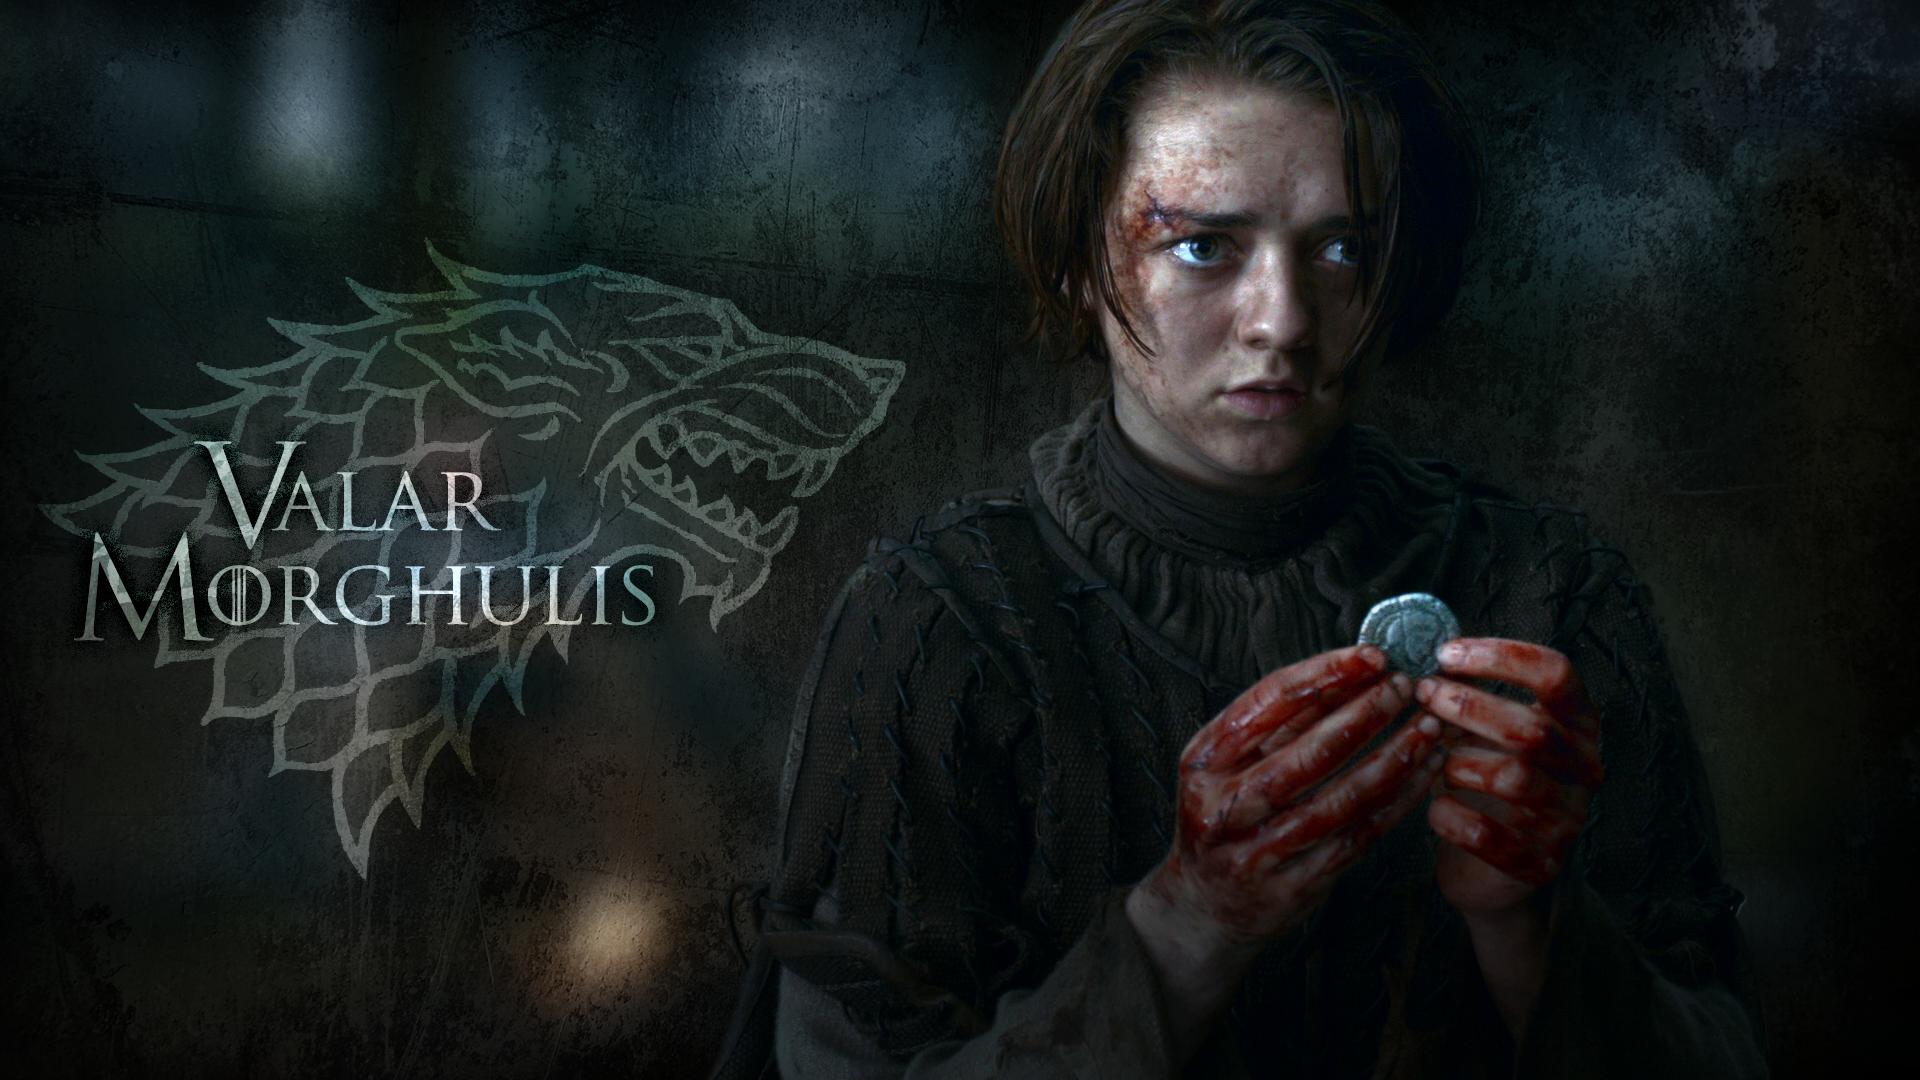 Game Of Thrones Season 4 Valar Morghulis Arya wwwimgkid 1920x1080